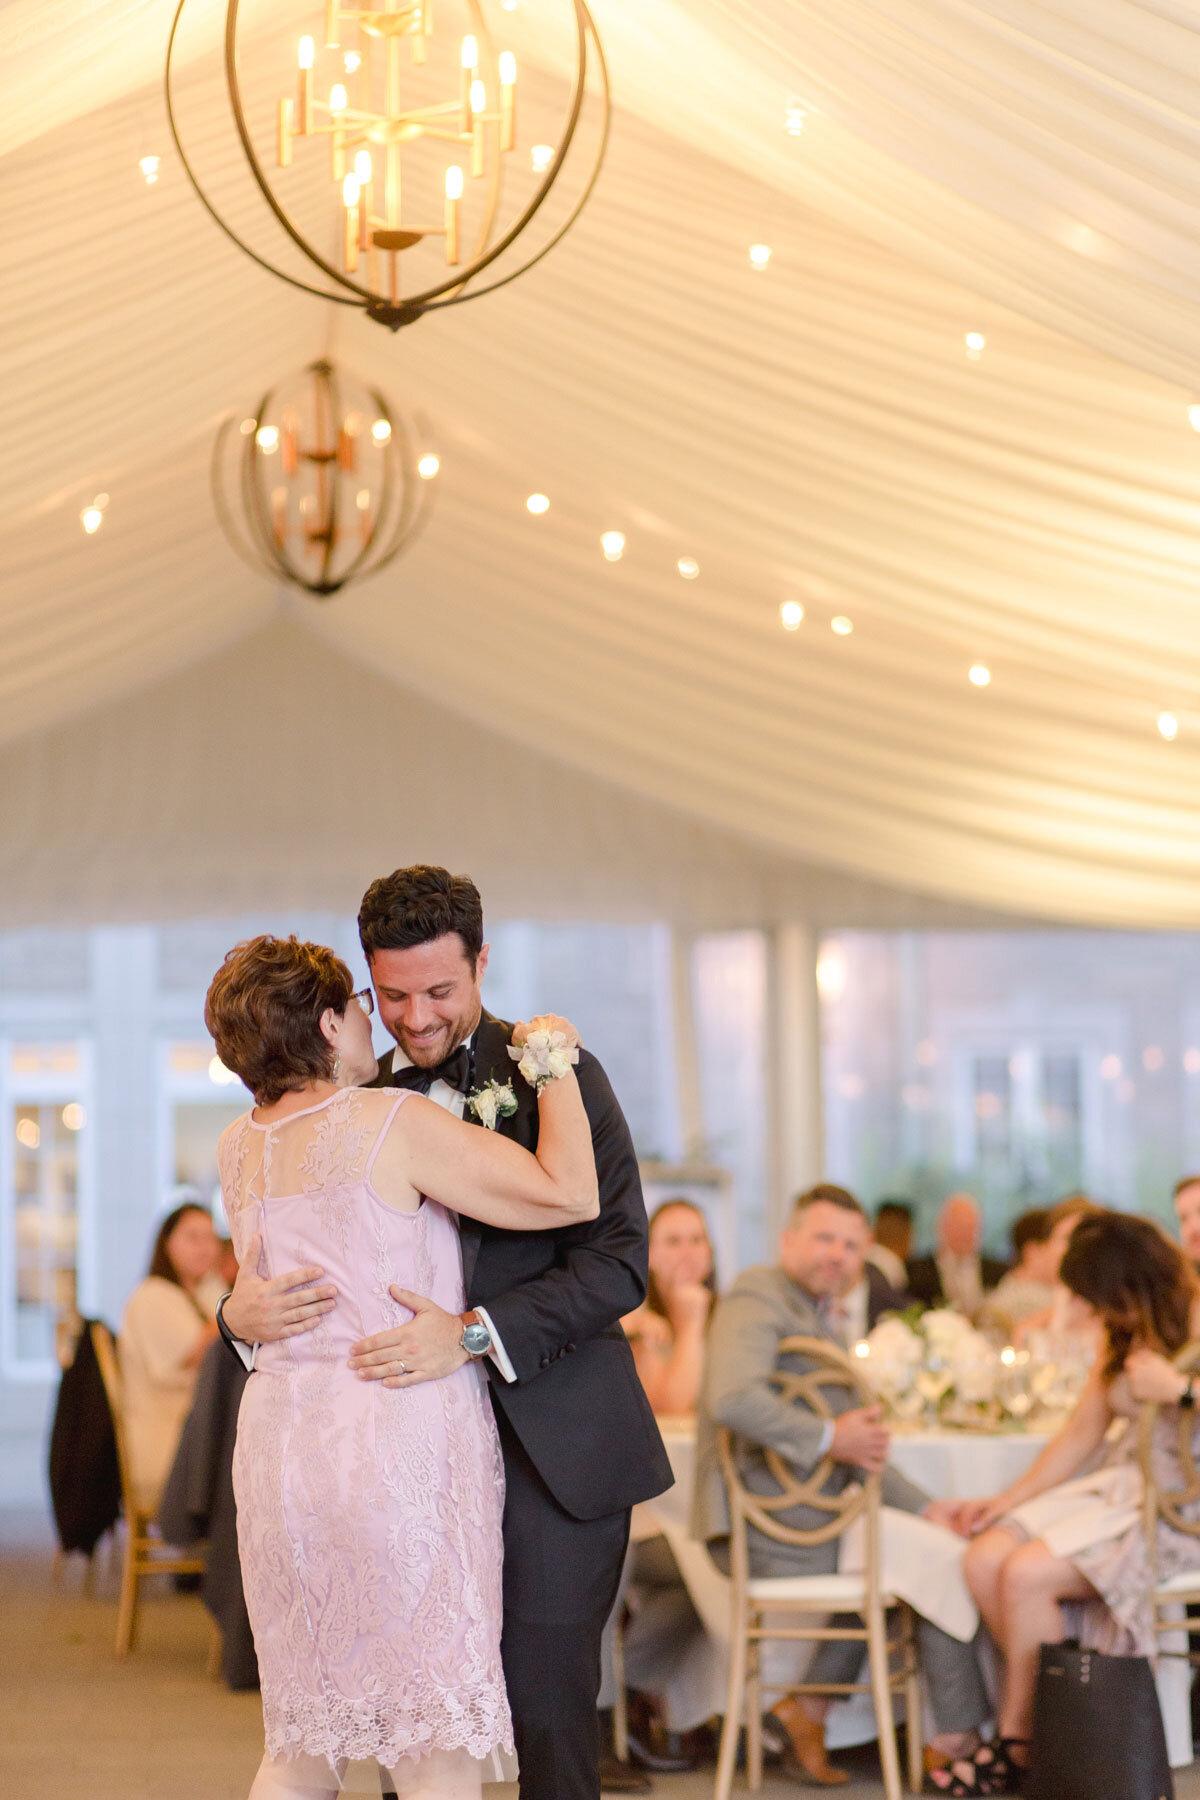 Chateau-des-Charmes-Wedding-Summer-Vineyard-Bride-Niagara-on-the-Lake-photos-by-Gemini-Photography-Ontario-0084.jpg